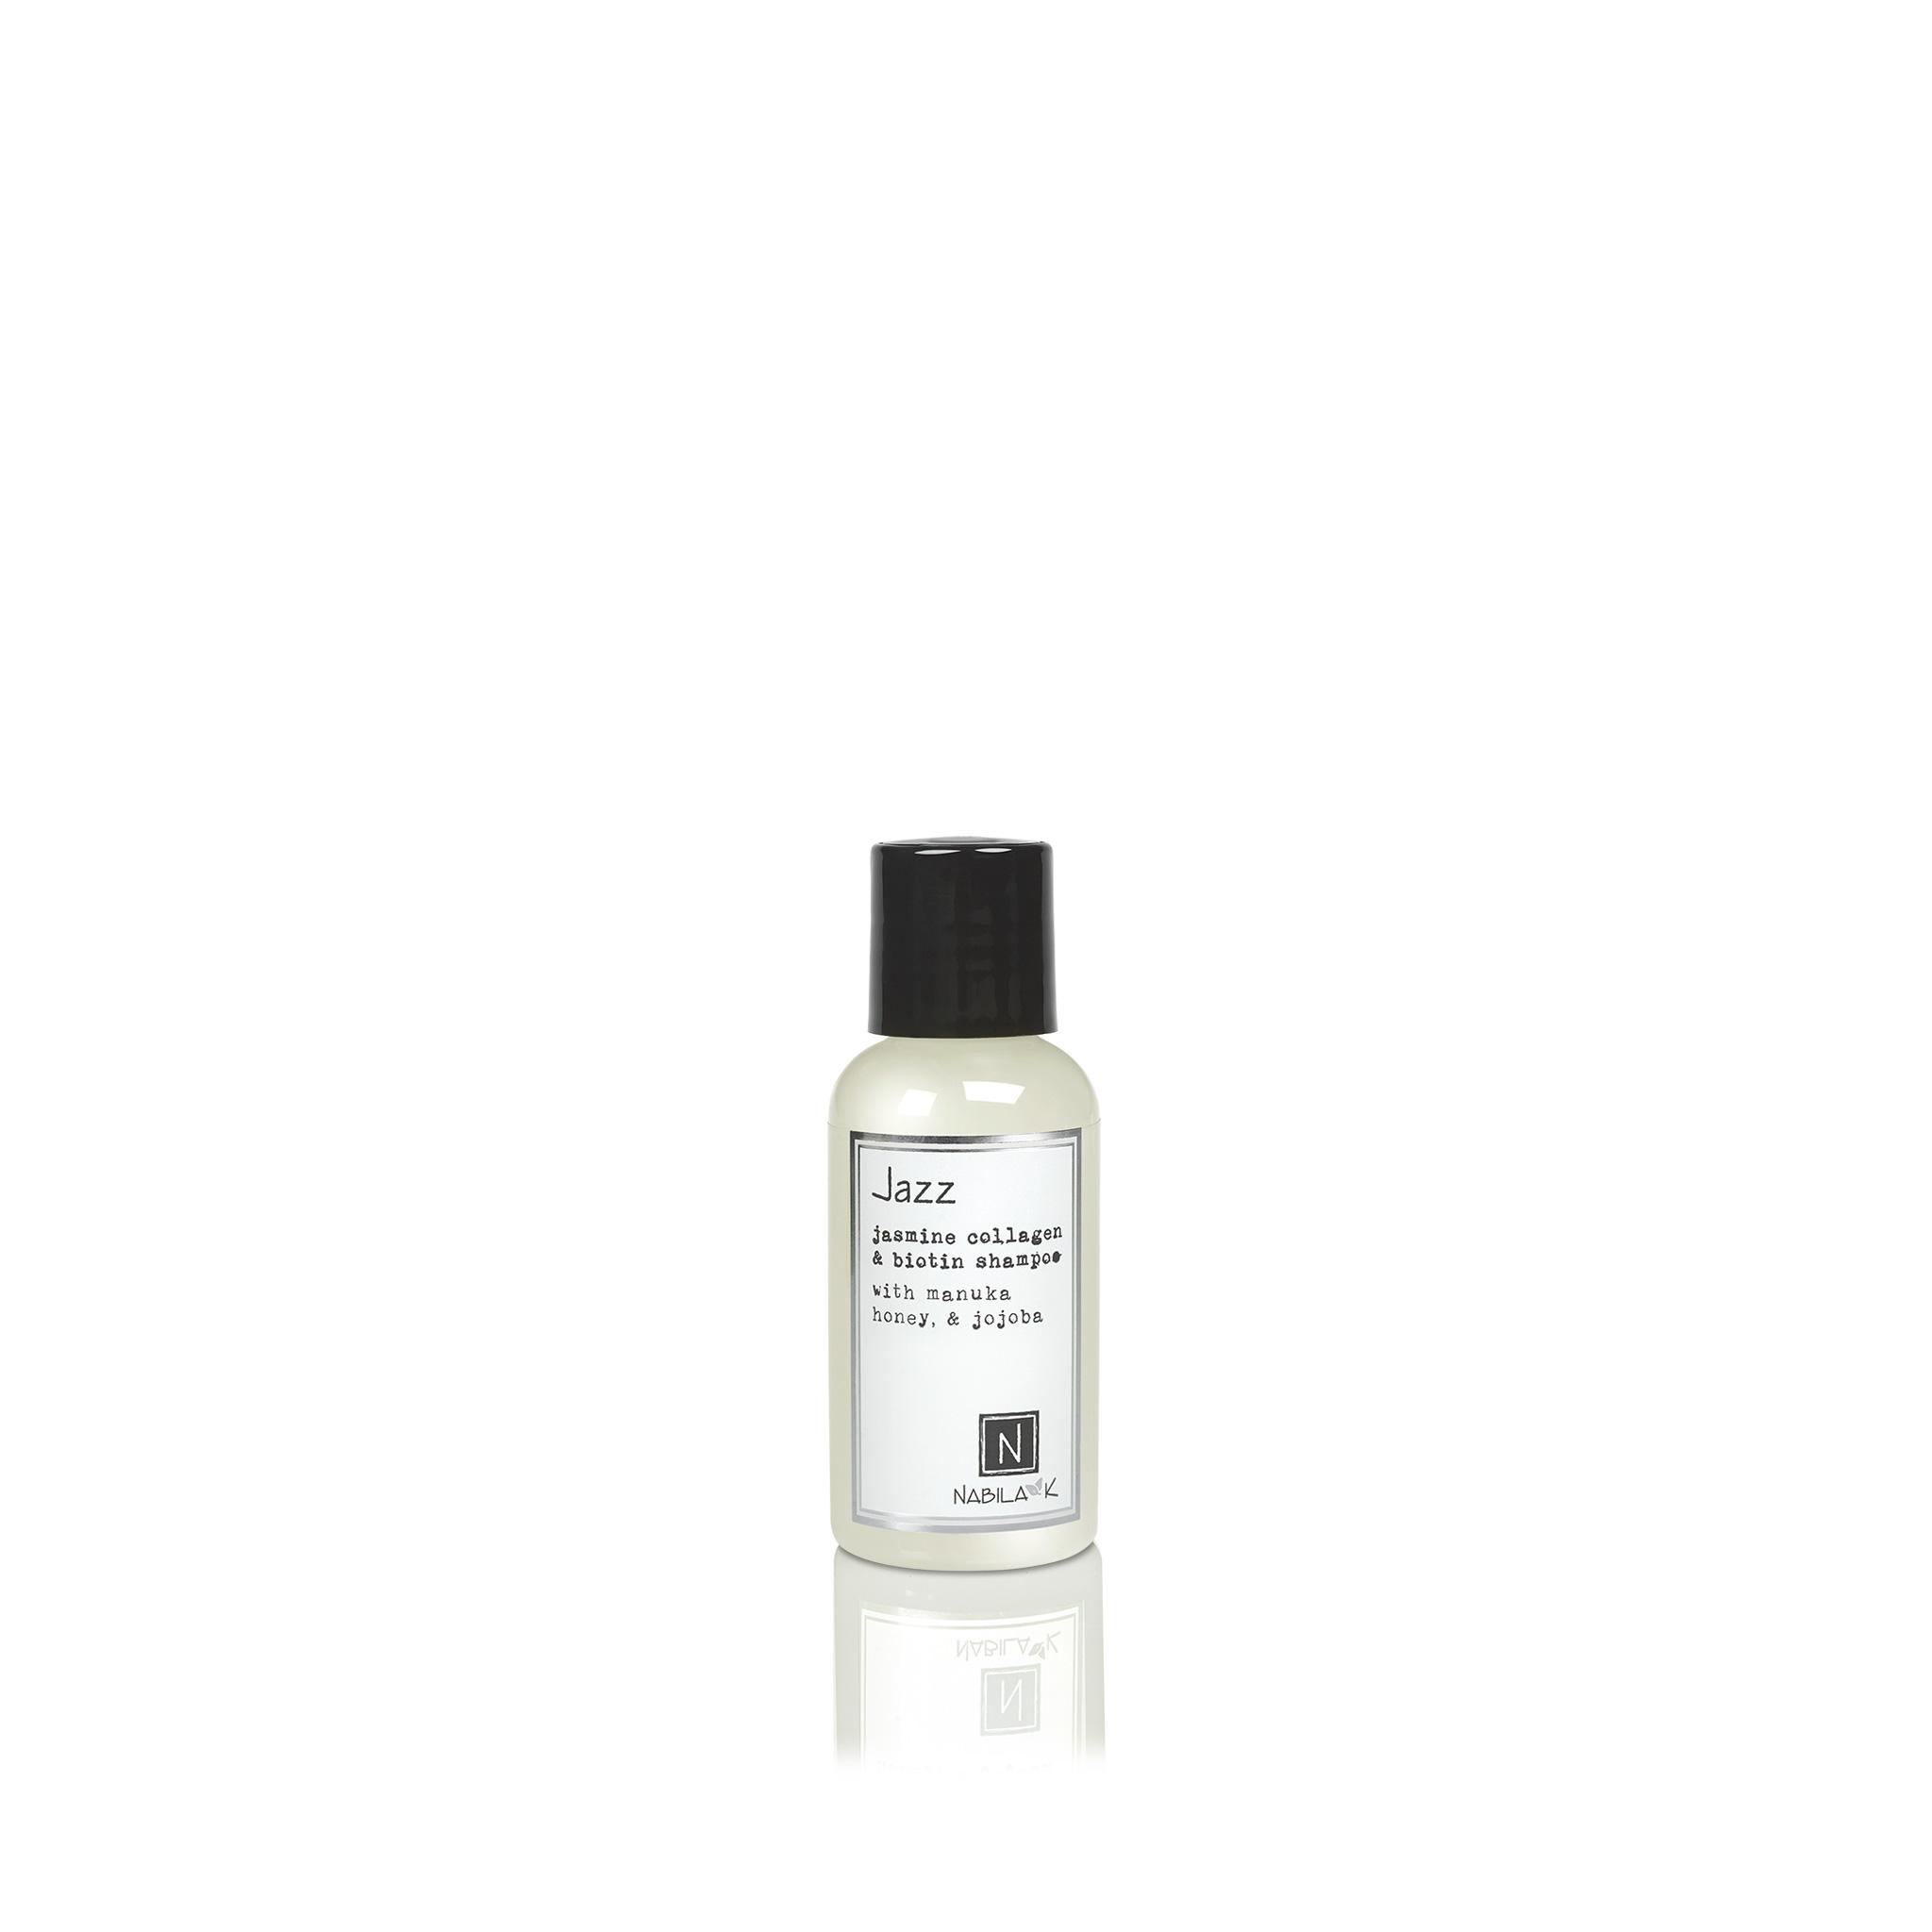 1 Travel Sized Bottle of Jasmine Collagen and Biotin Shampoo with Maunka Honey and Jojoba